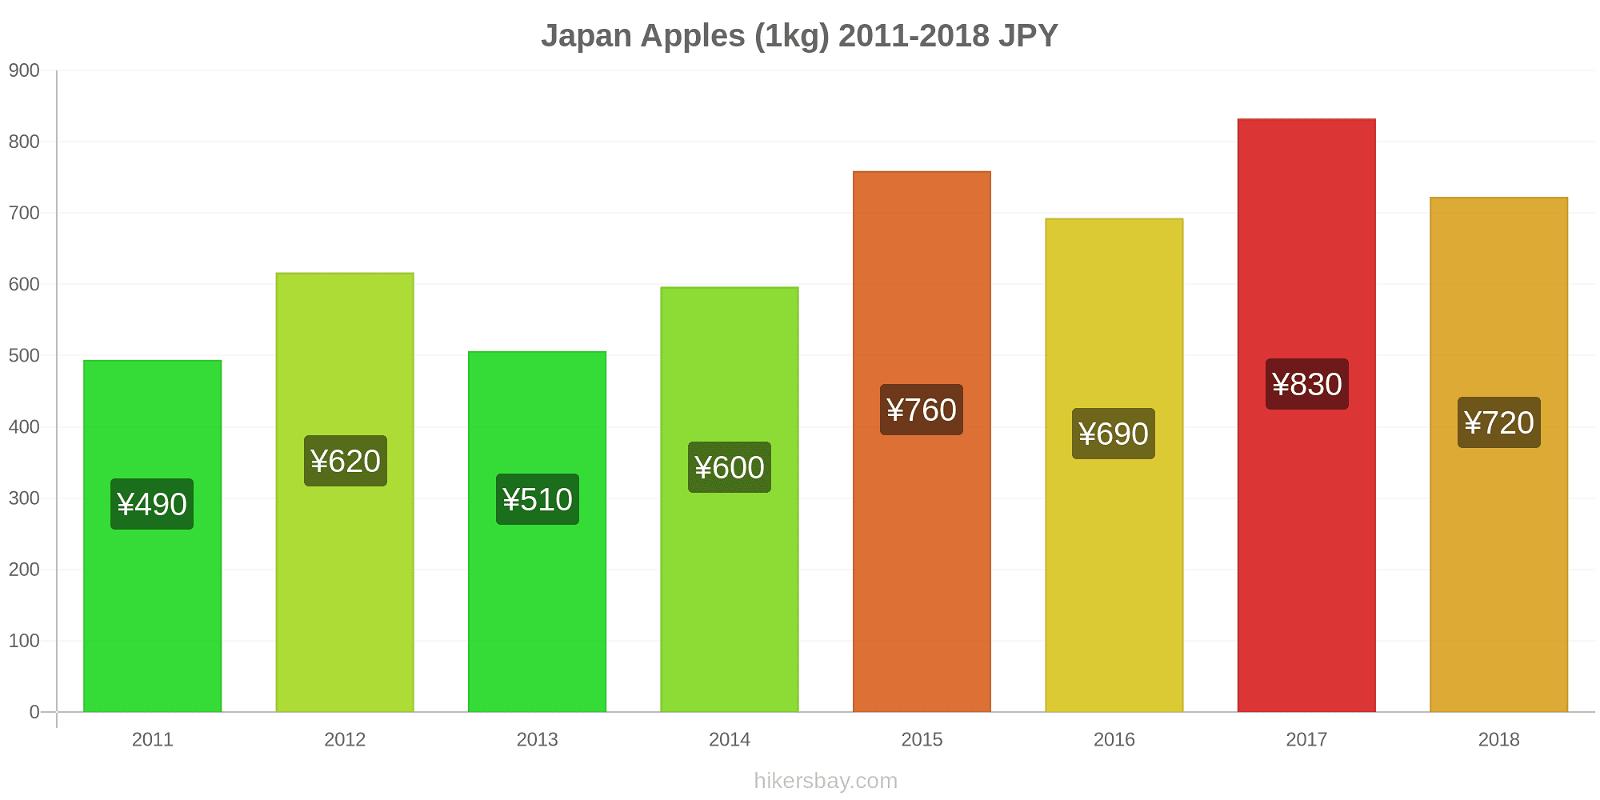 Japan price changes Apples (1kg) hikersbay.com